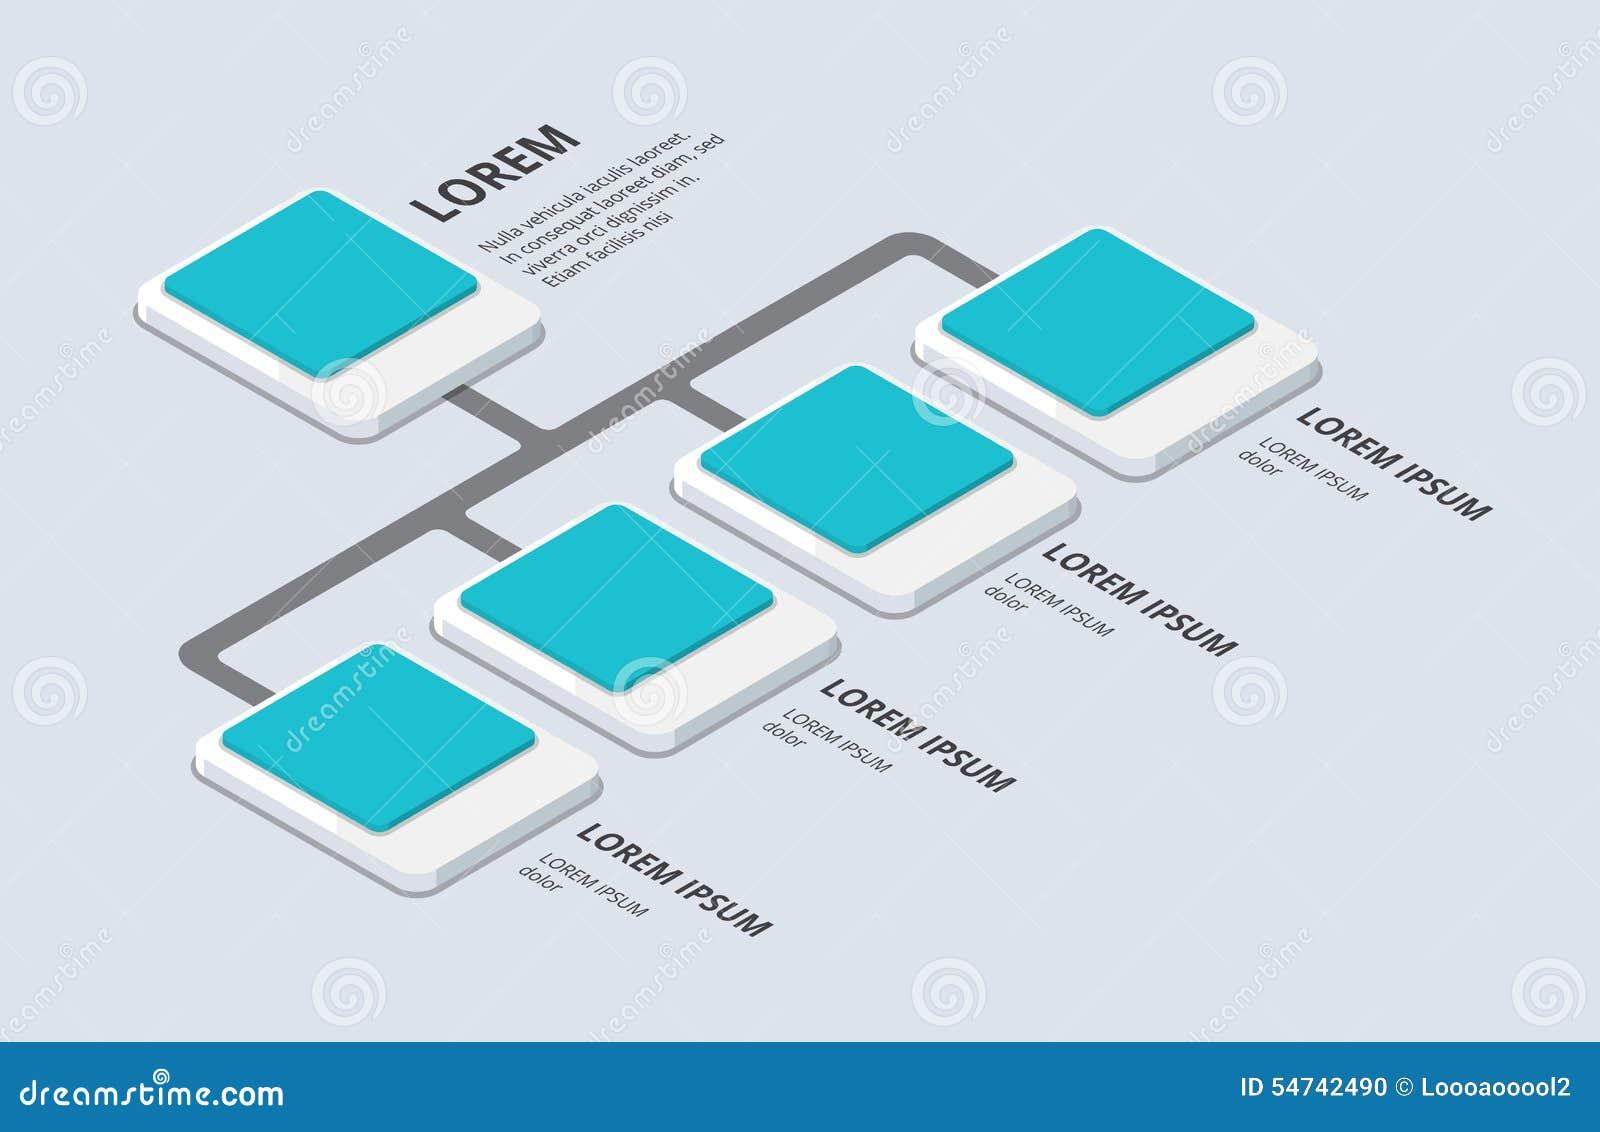 Равновеликие организация и sturcture плоская шипучка-u организации 3d